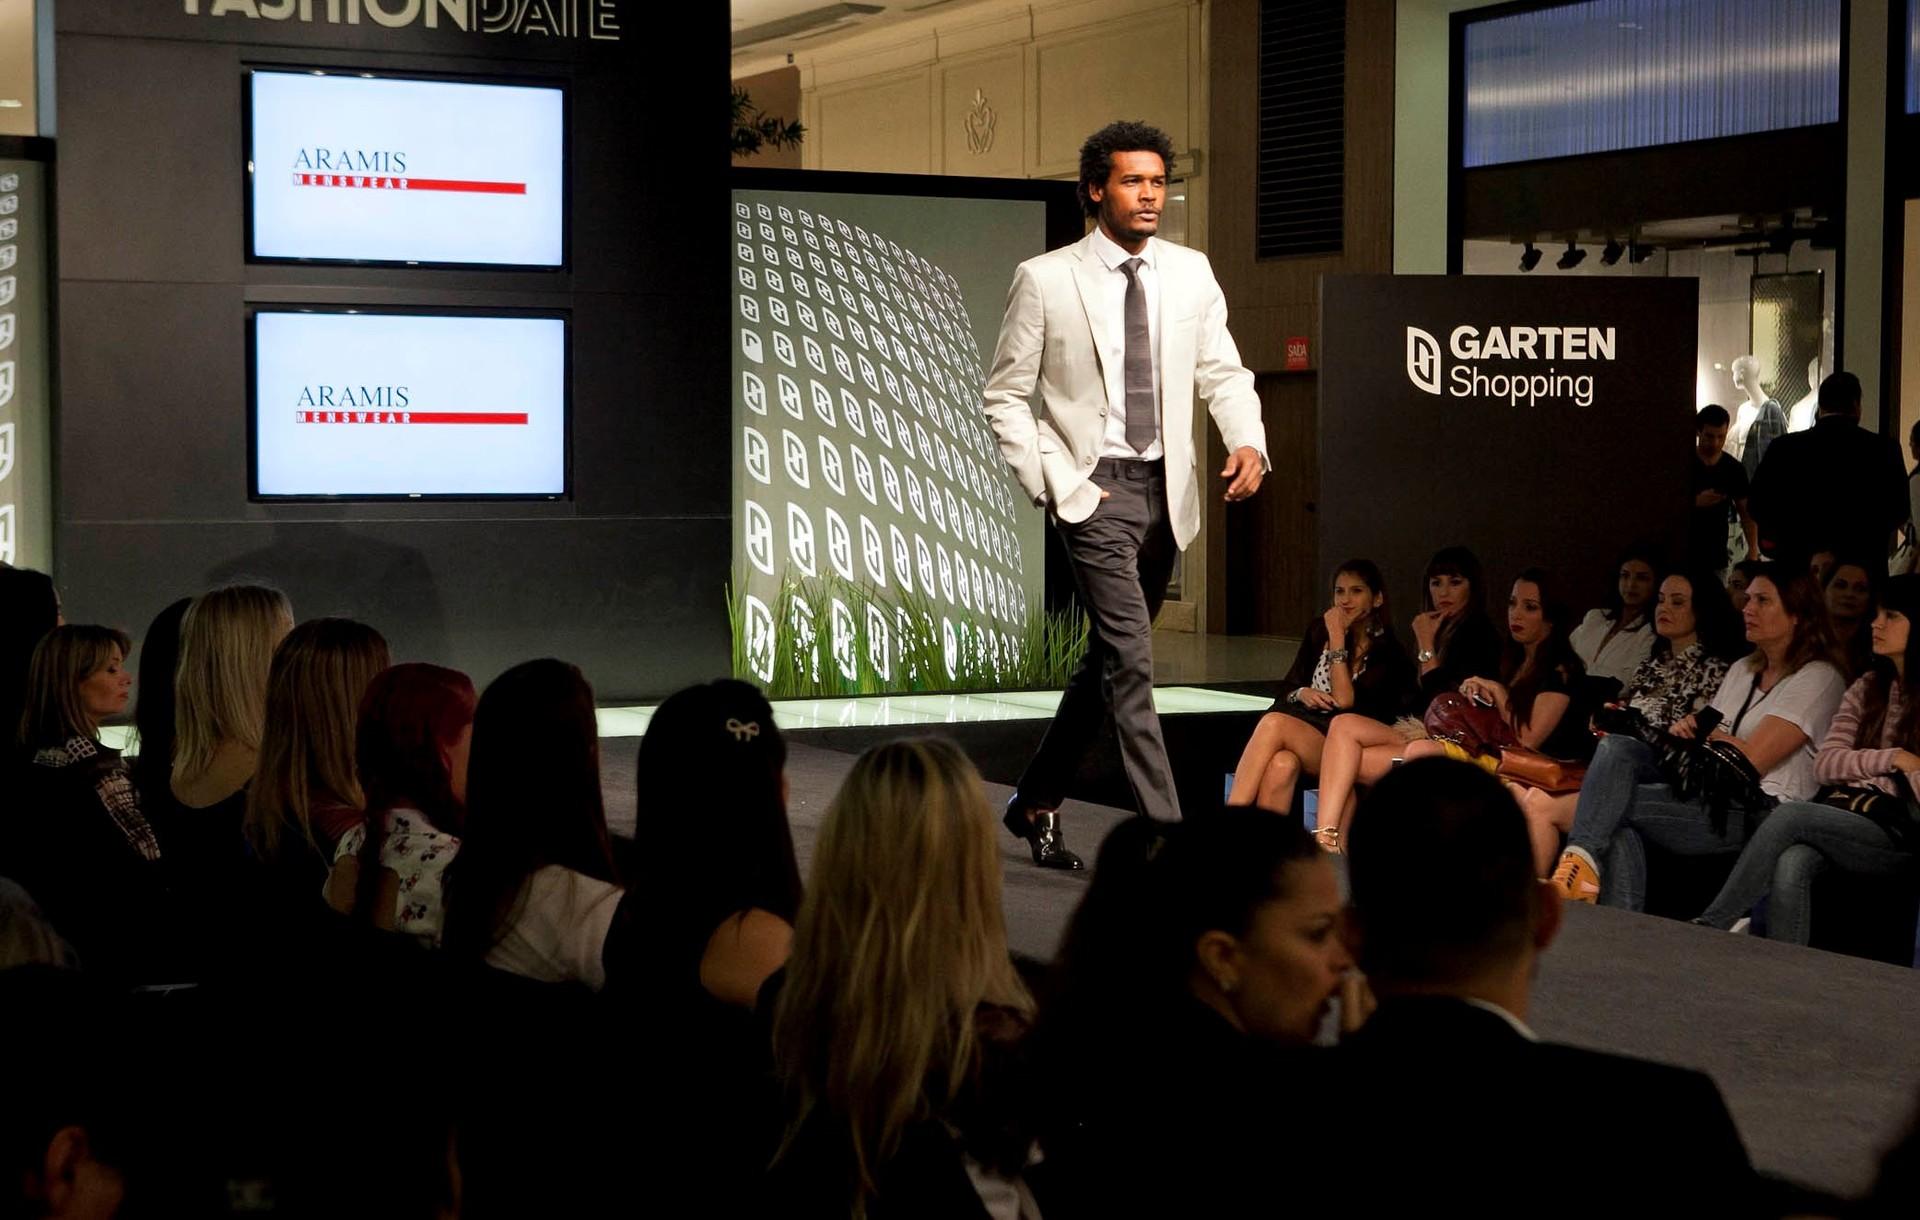 Aramis mostrou tendências para homens (Foto: José Luiz Somensi/Divulgação)